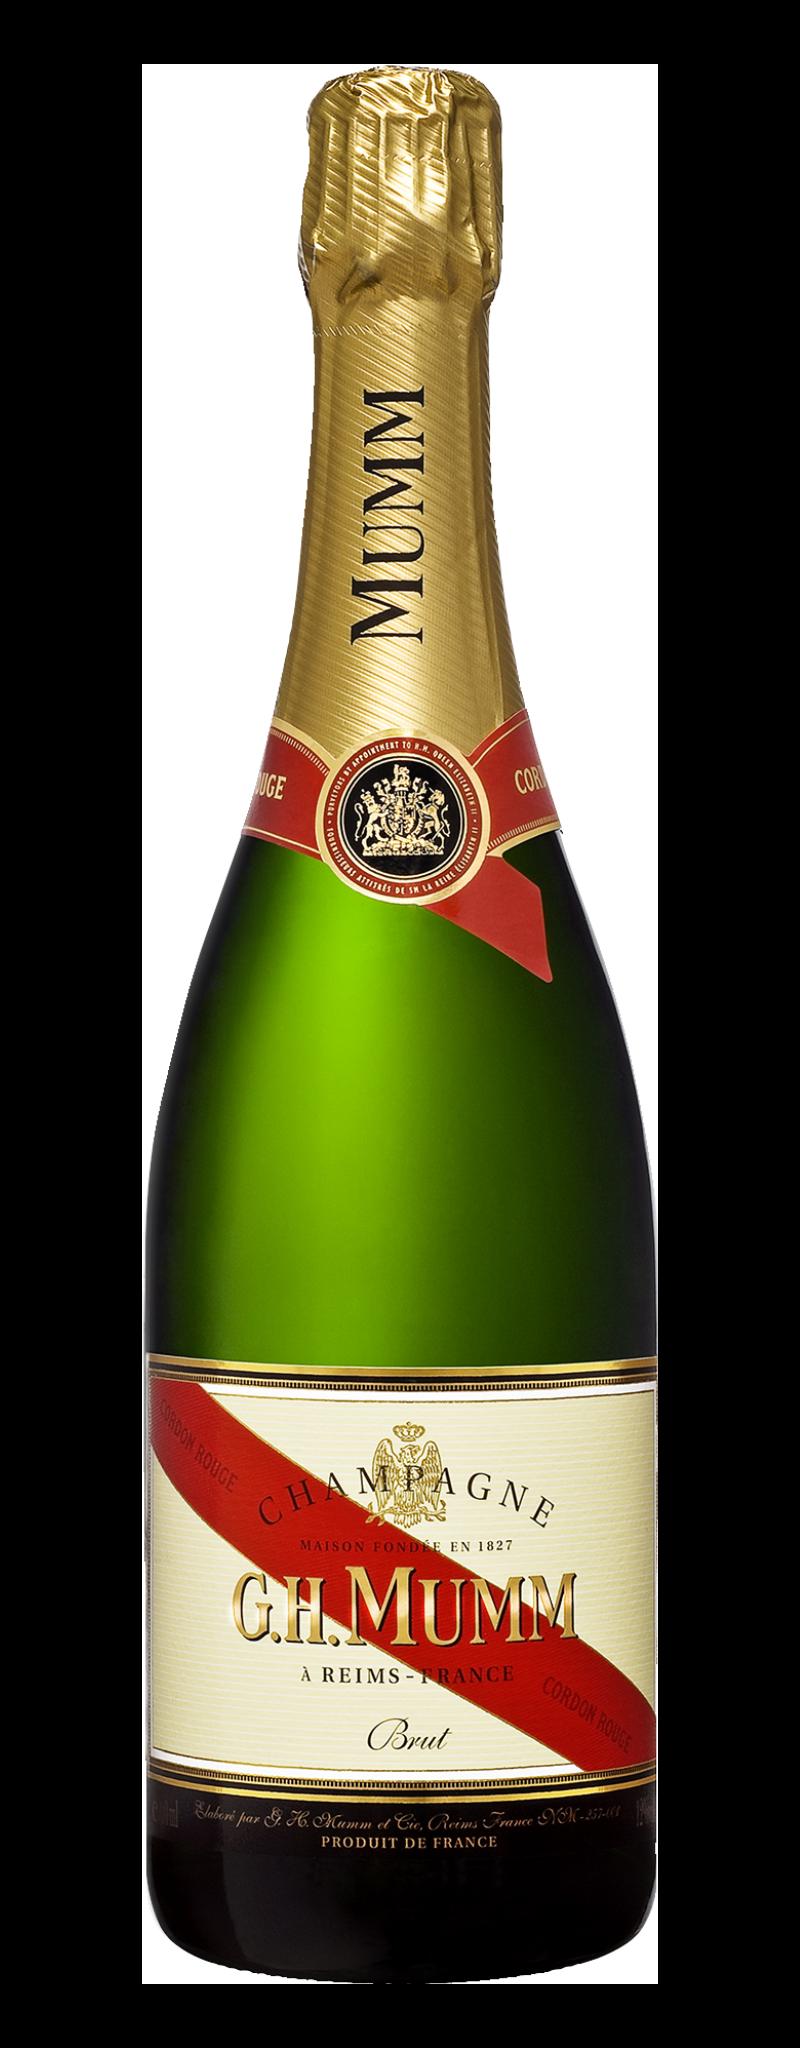 Champagne G.H. Mumm  - 750ml